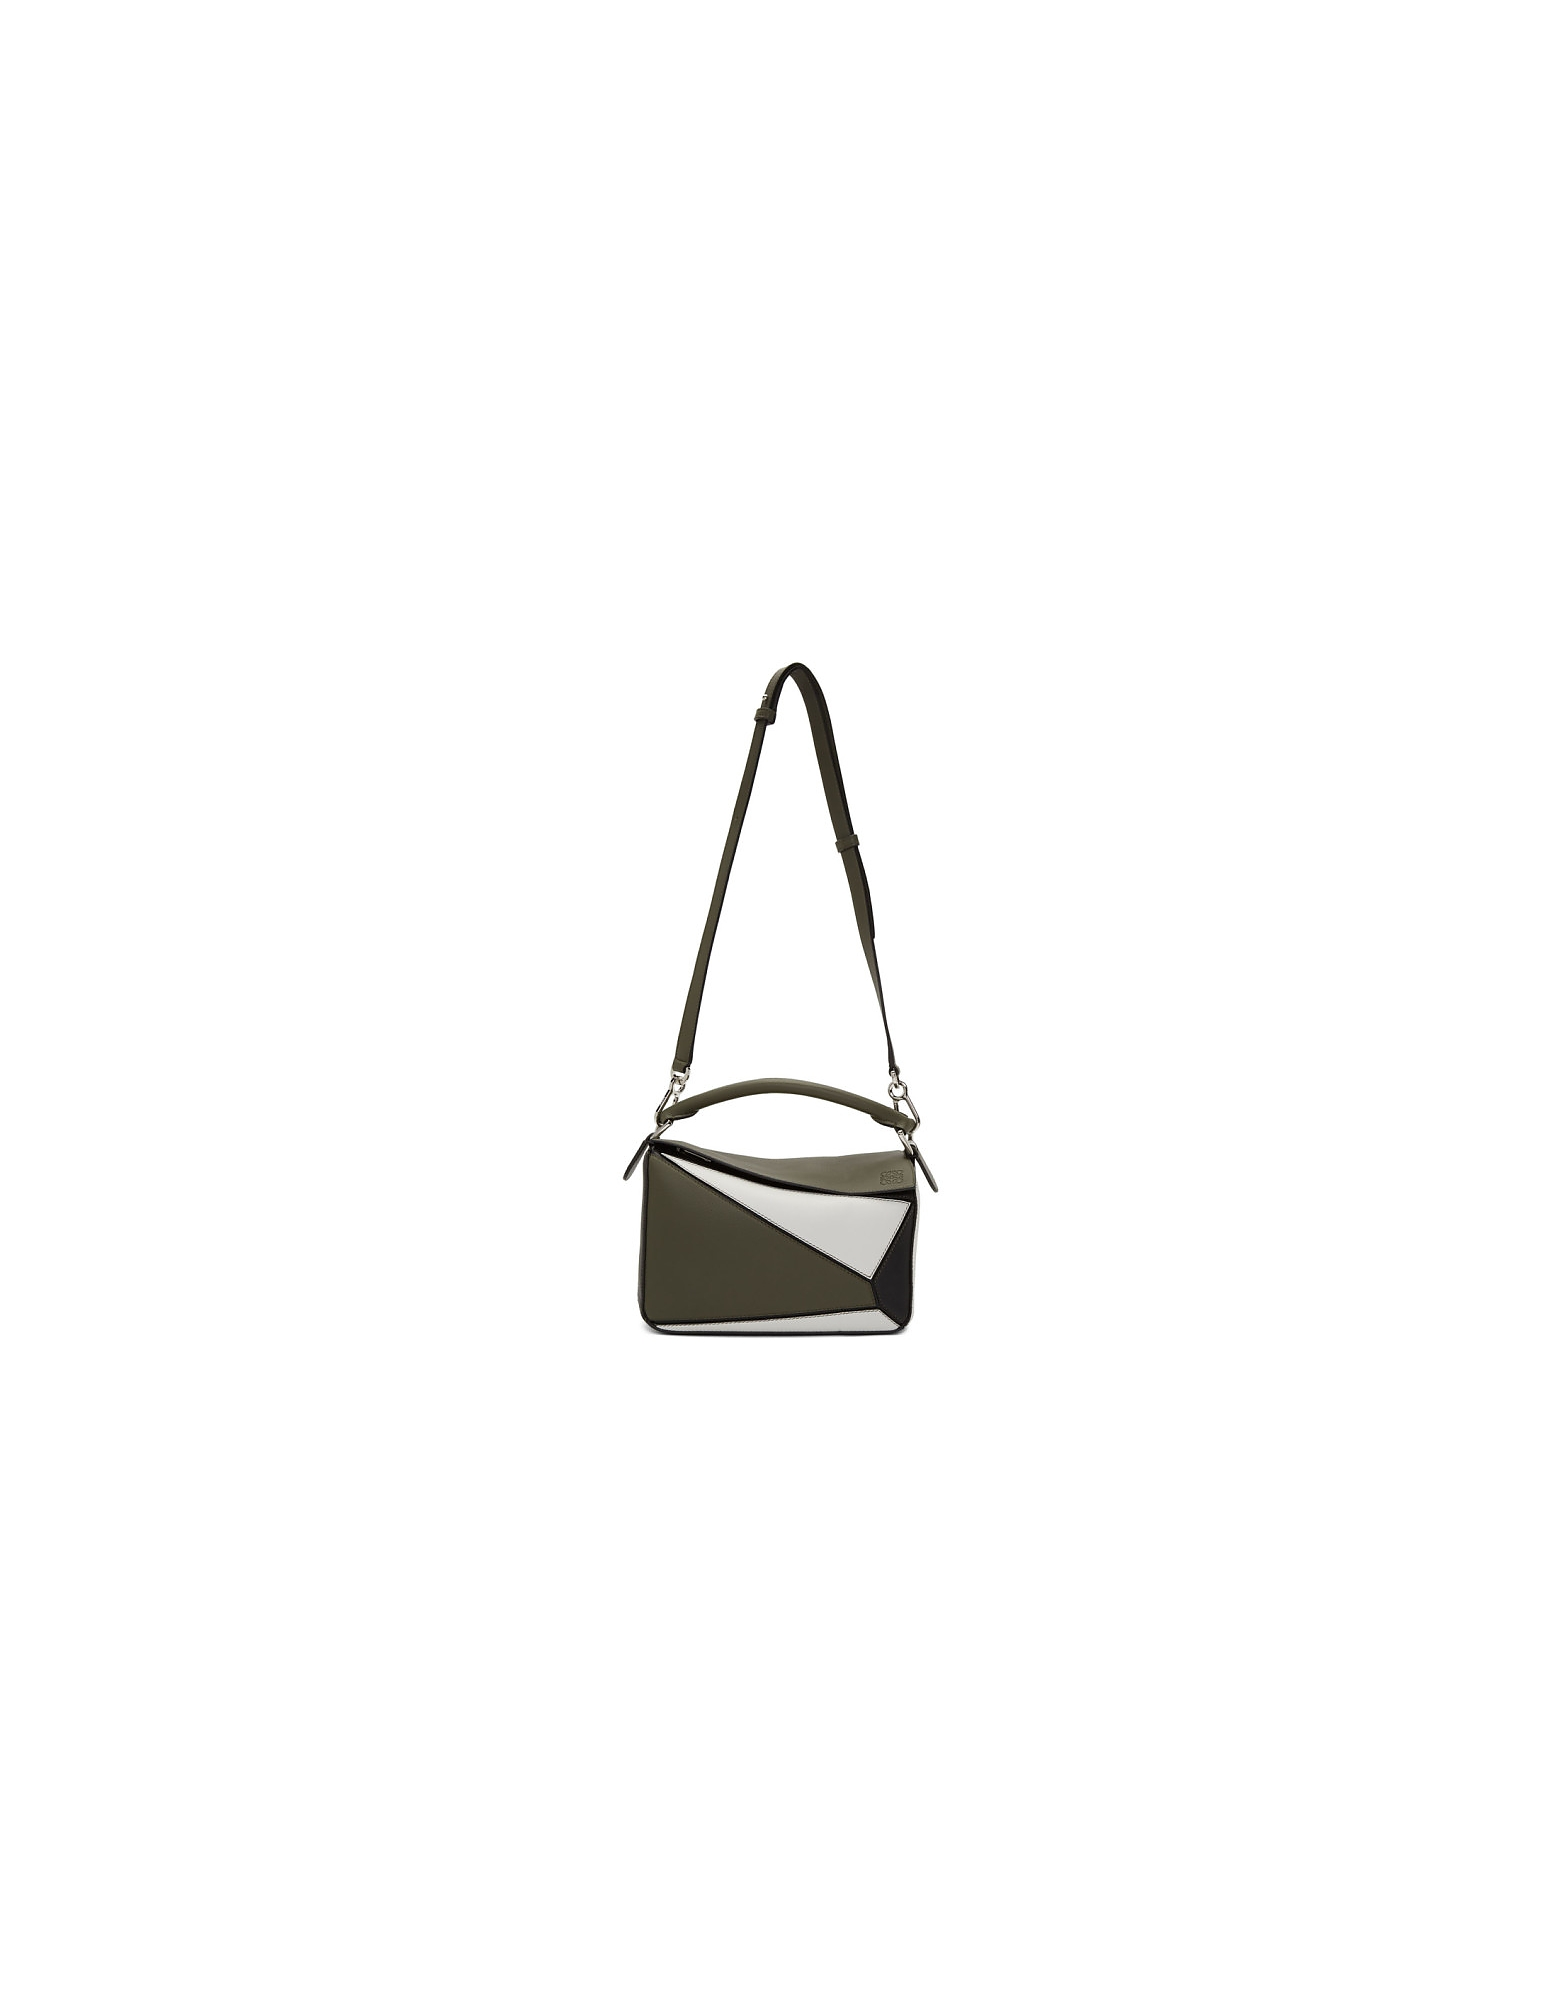 Loewe Designer Handbags, Green and White Small Puzzle Bag